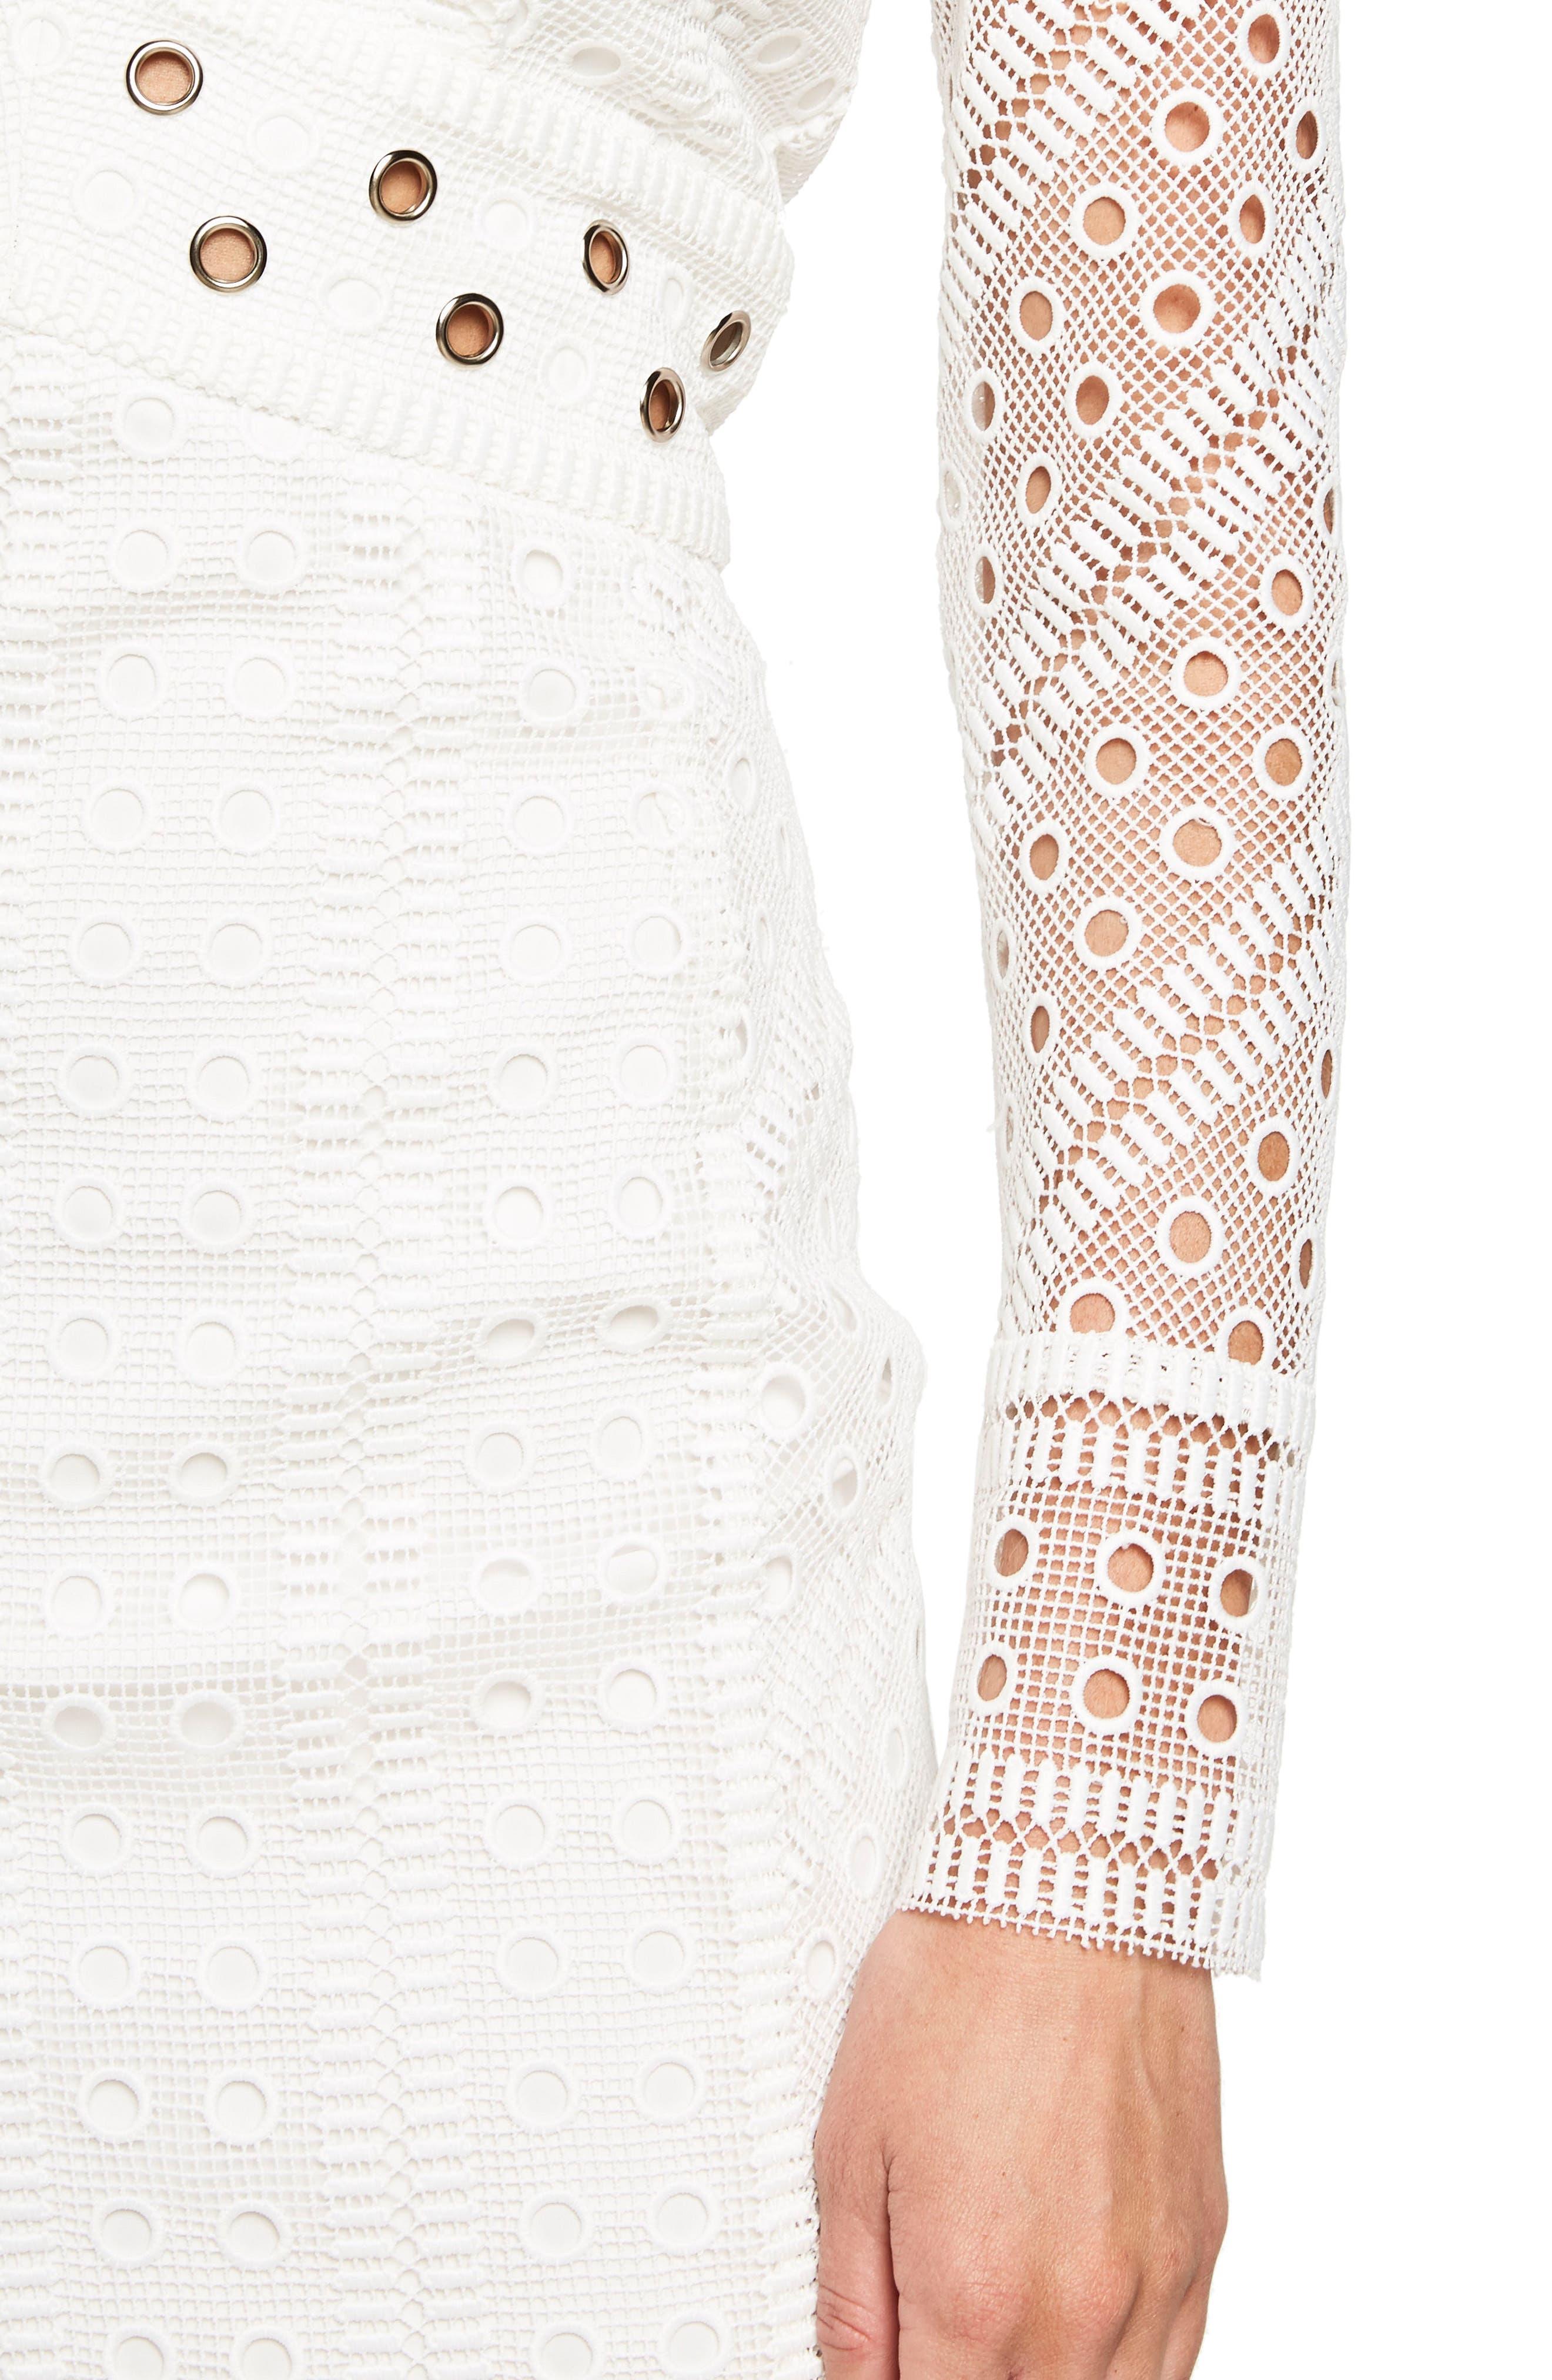 Grommet Detail Broderie Anglaise Dress,                             Alternate thumbnail 4, color,